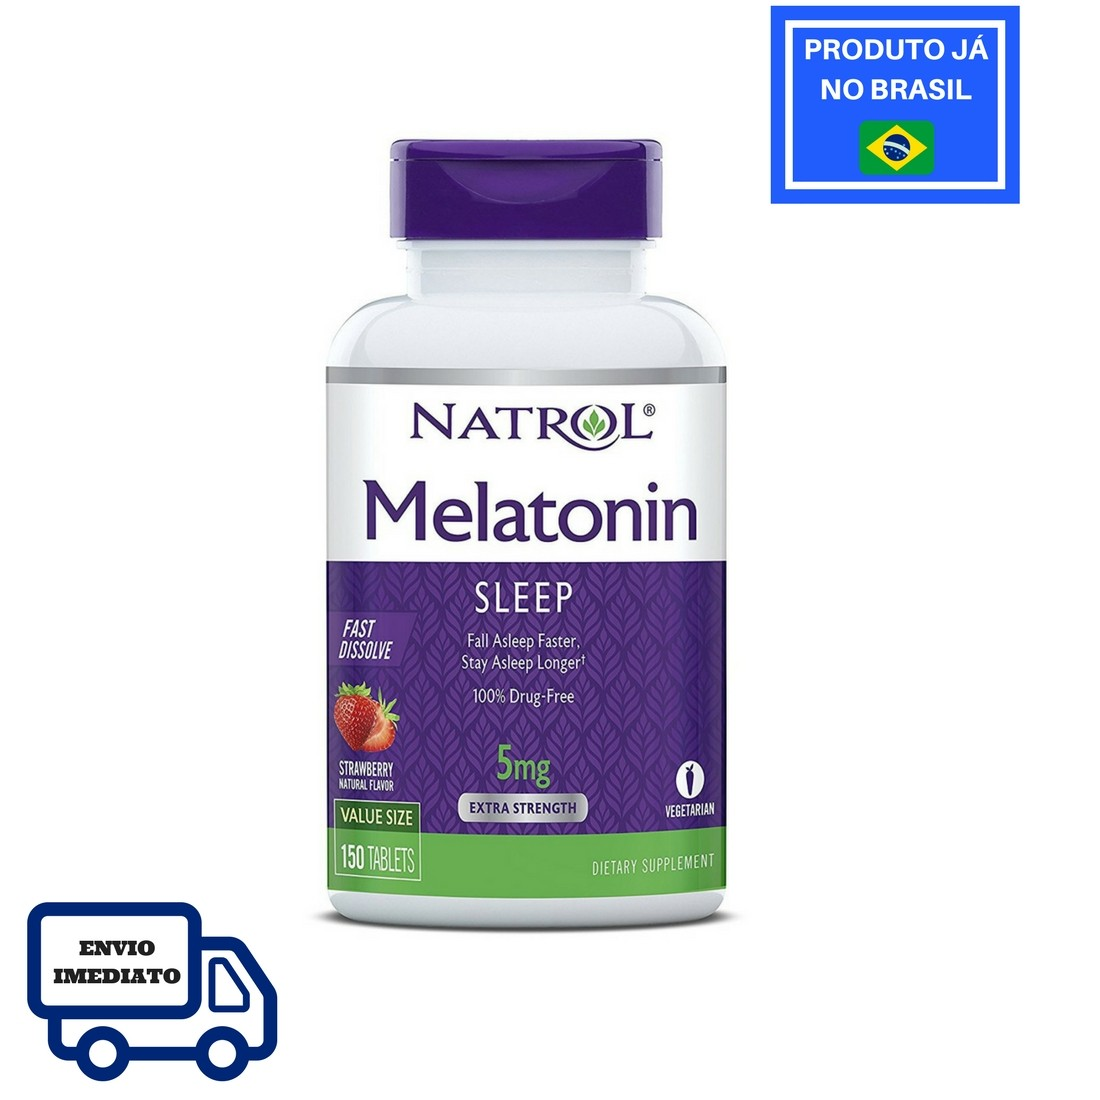 Melatonina Natrol - Fast Dissolve - Sabor Morango 5mg (150 Tabletes)